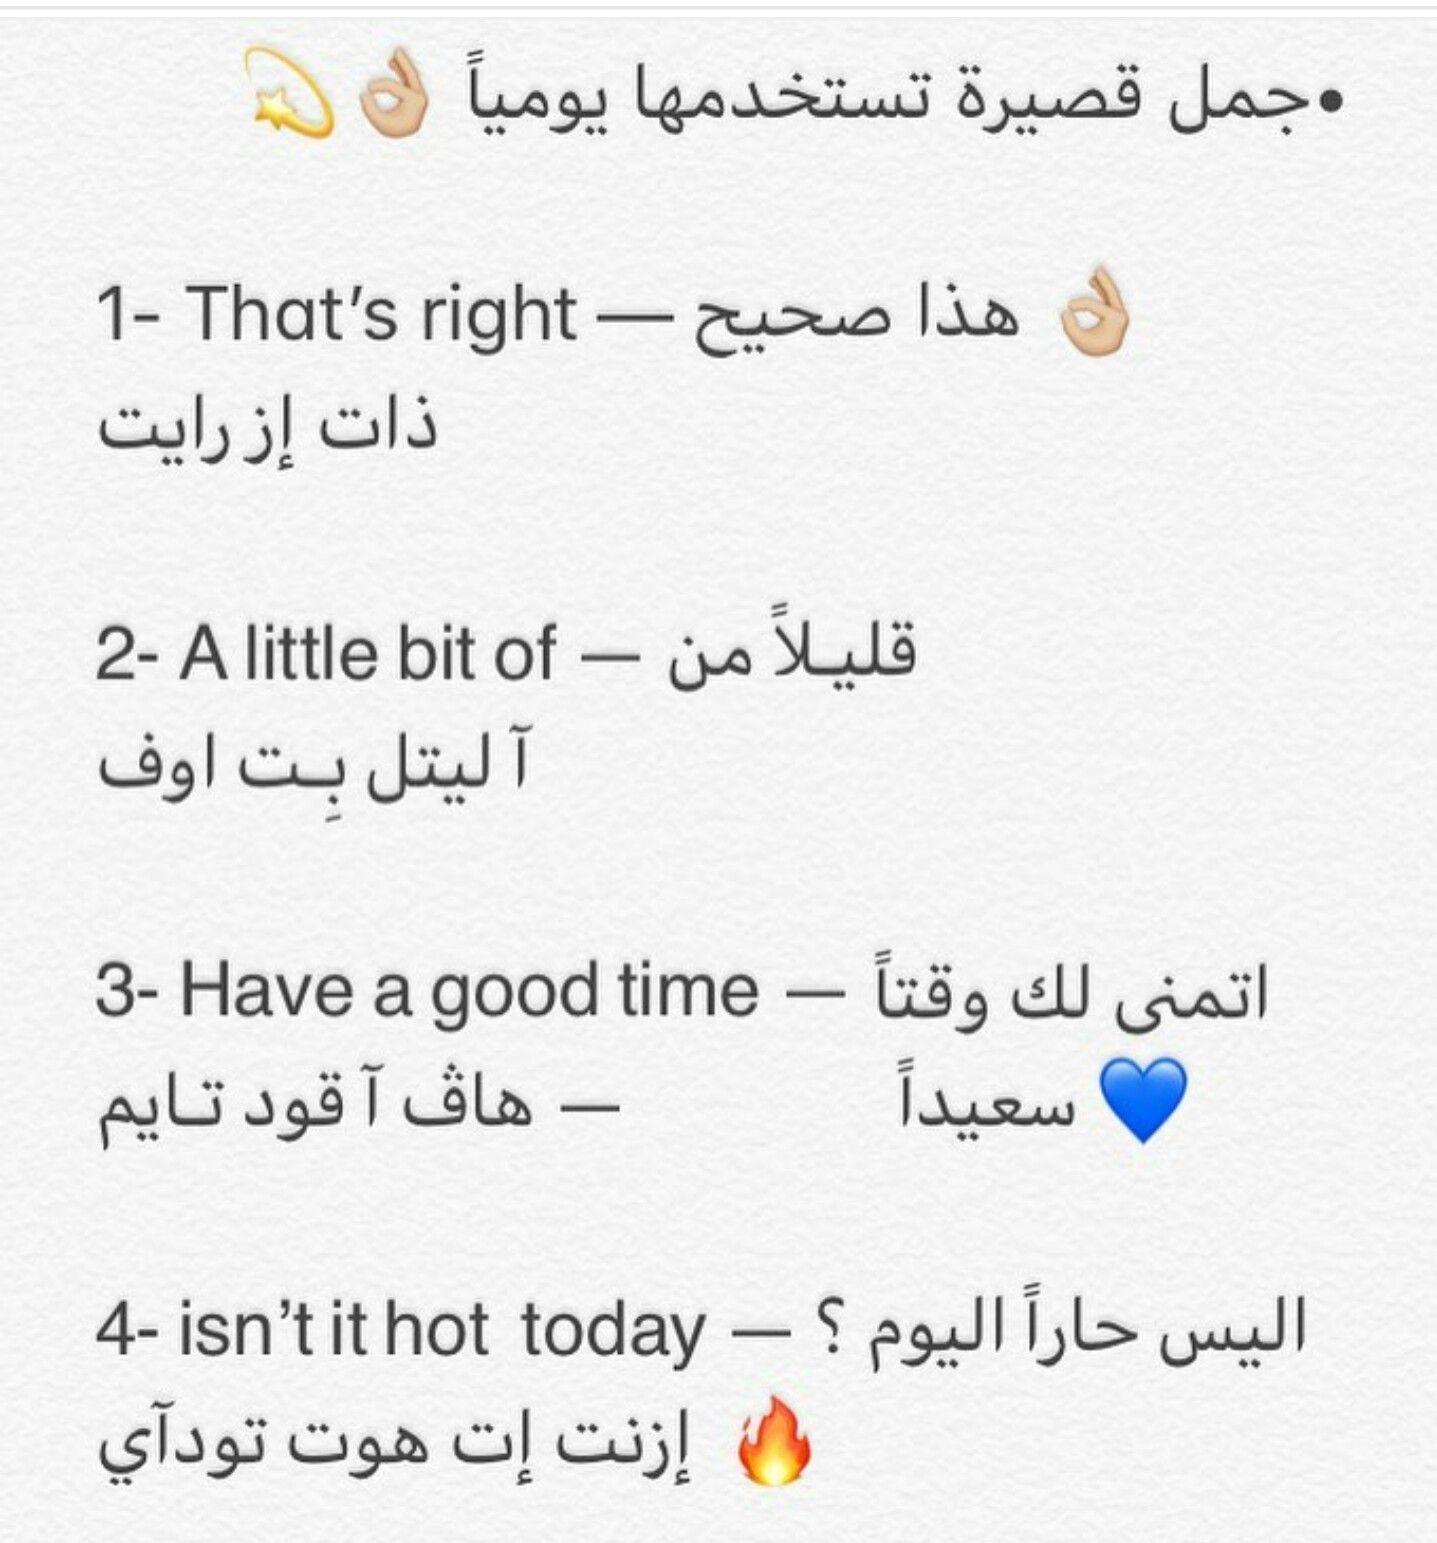 Learning Arabic Msa Fabiennem English Language Learning Grammar English Vocabulary Words English Language Learning